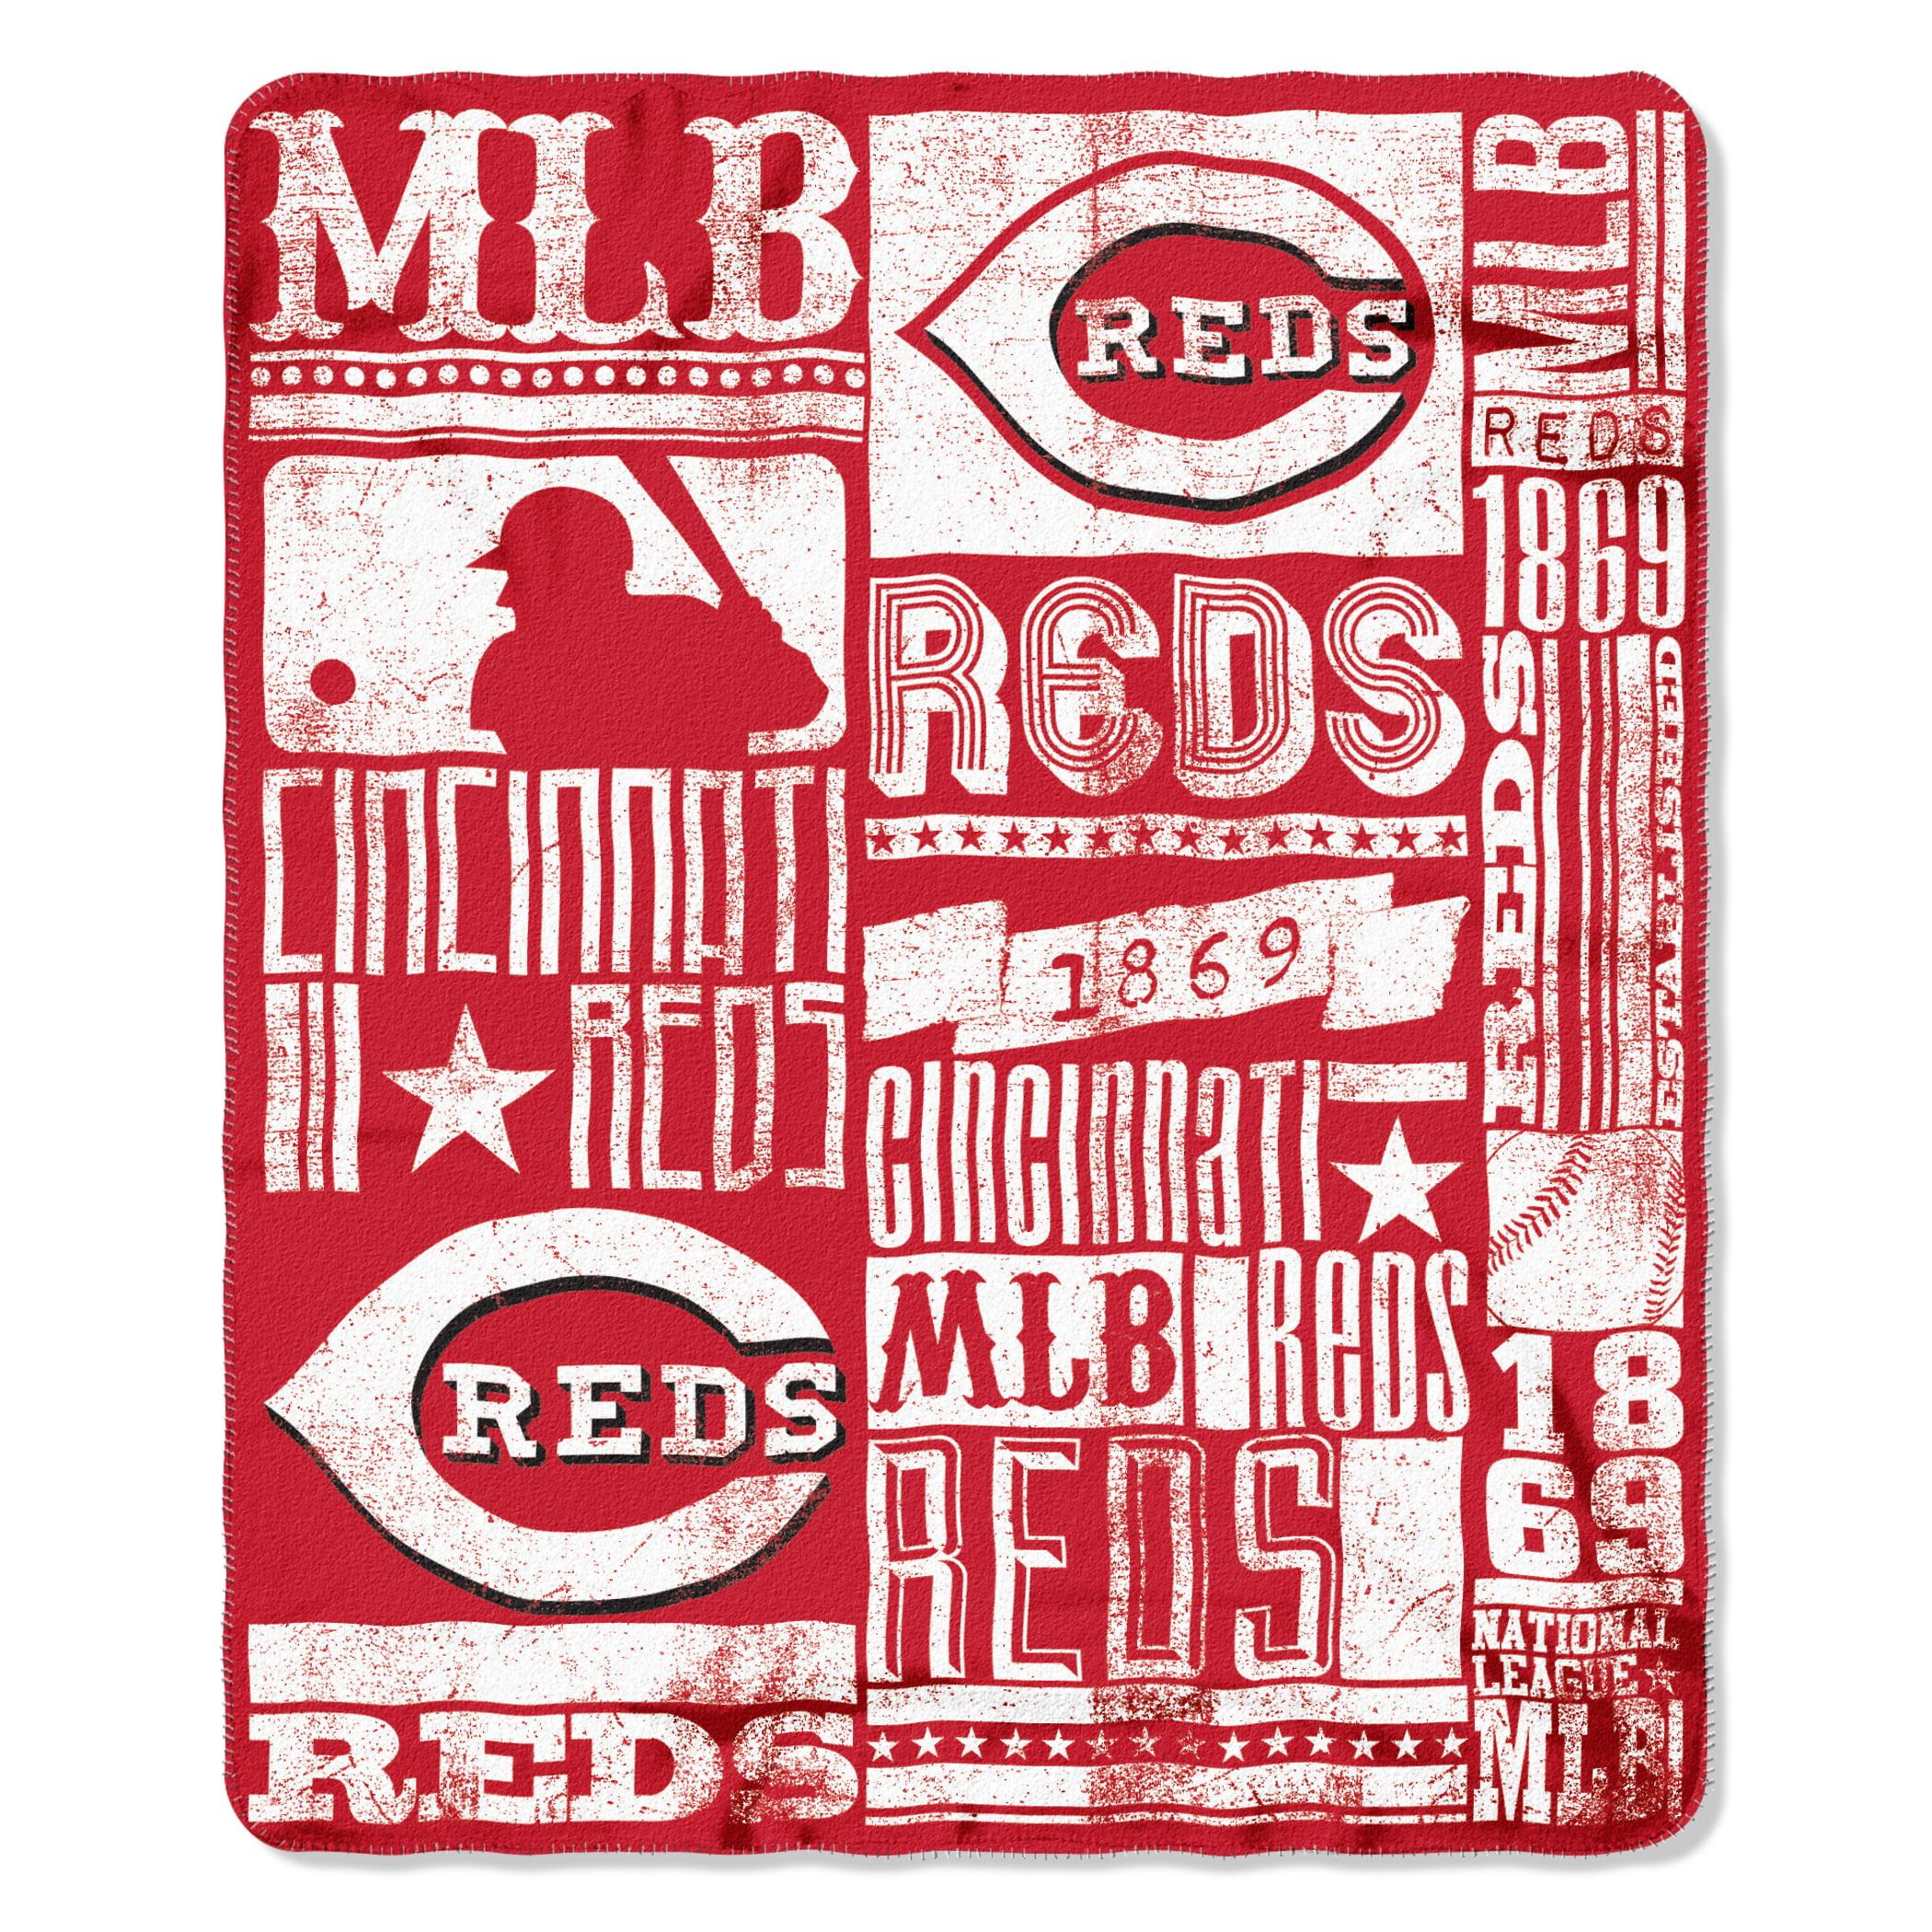 Reds OFFICIAL Major League Baseball, Strength 50x 60 Fleece Throw  by The Northwest Company